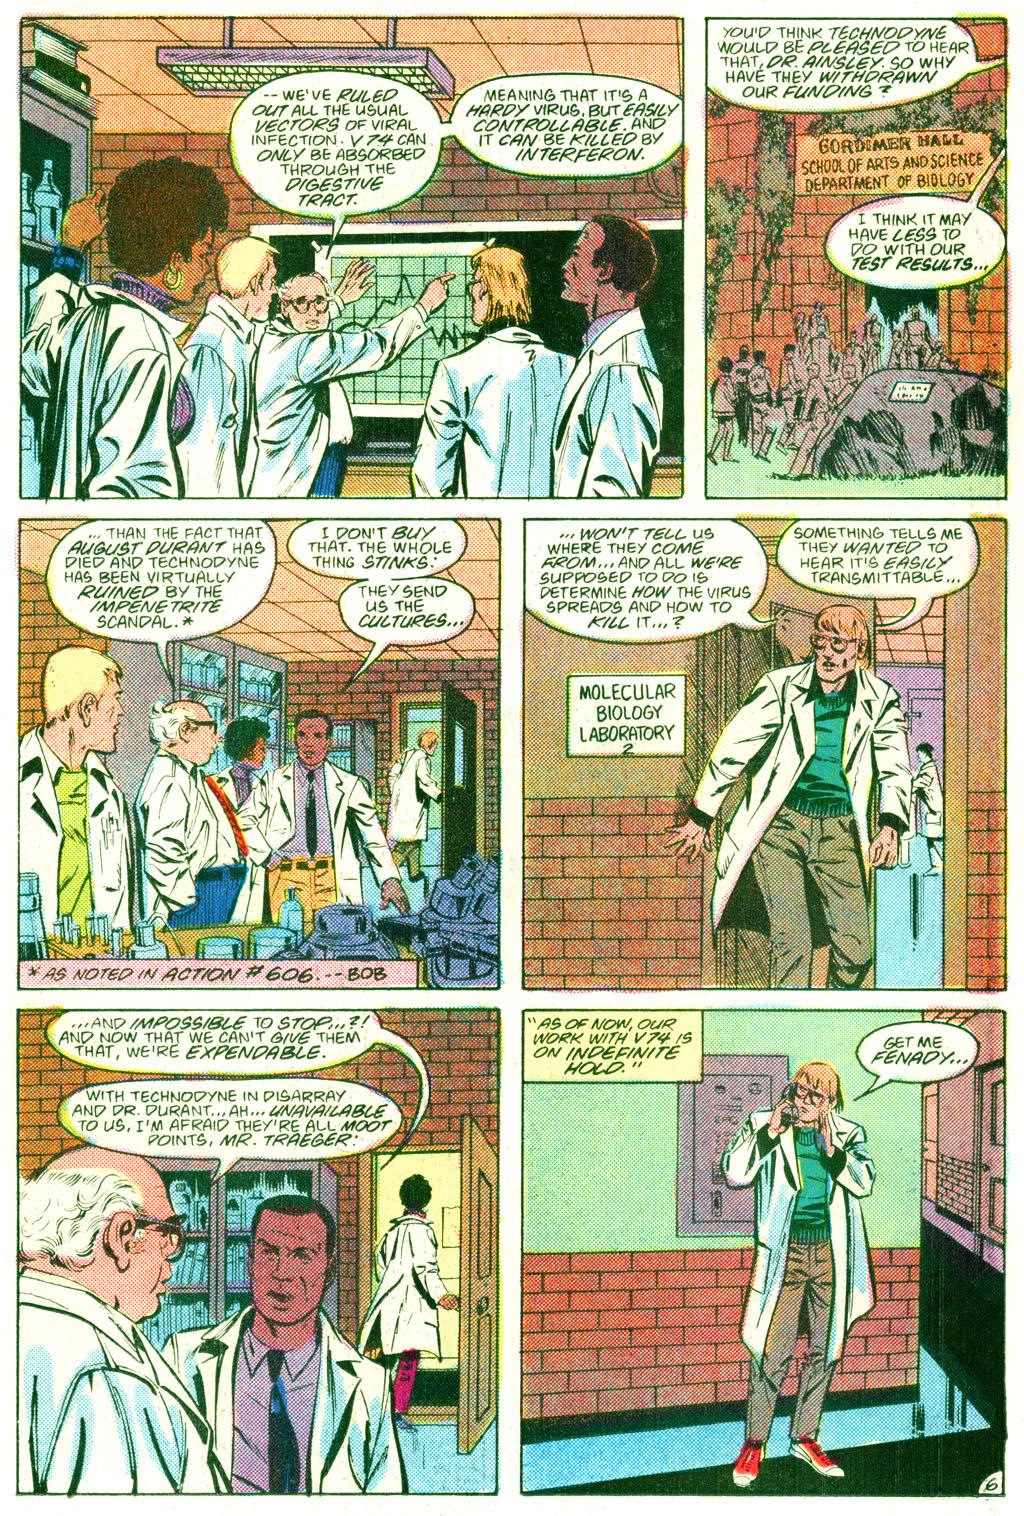 Action Comics (1938) 620 Page 21